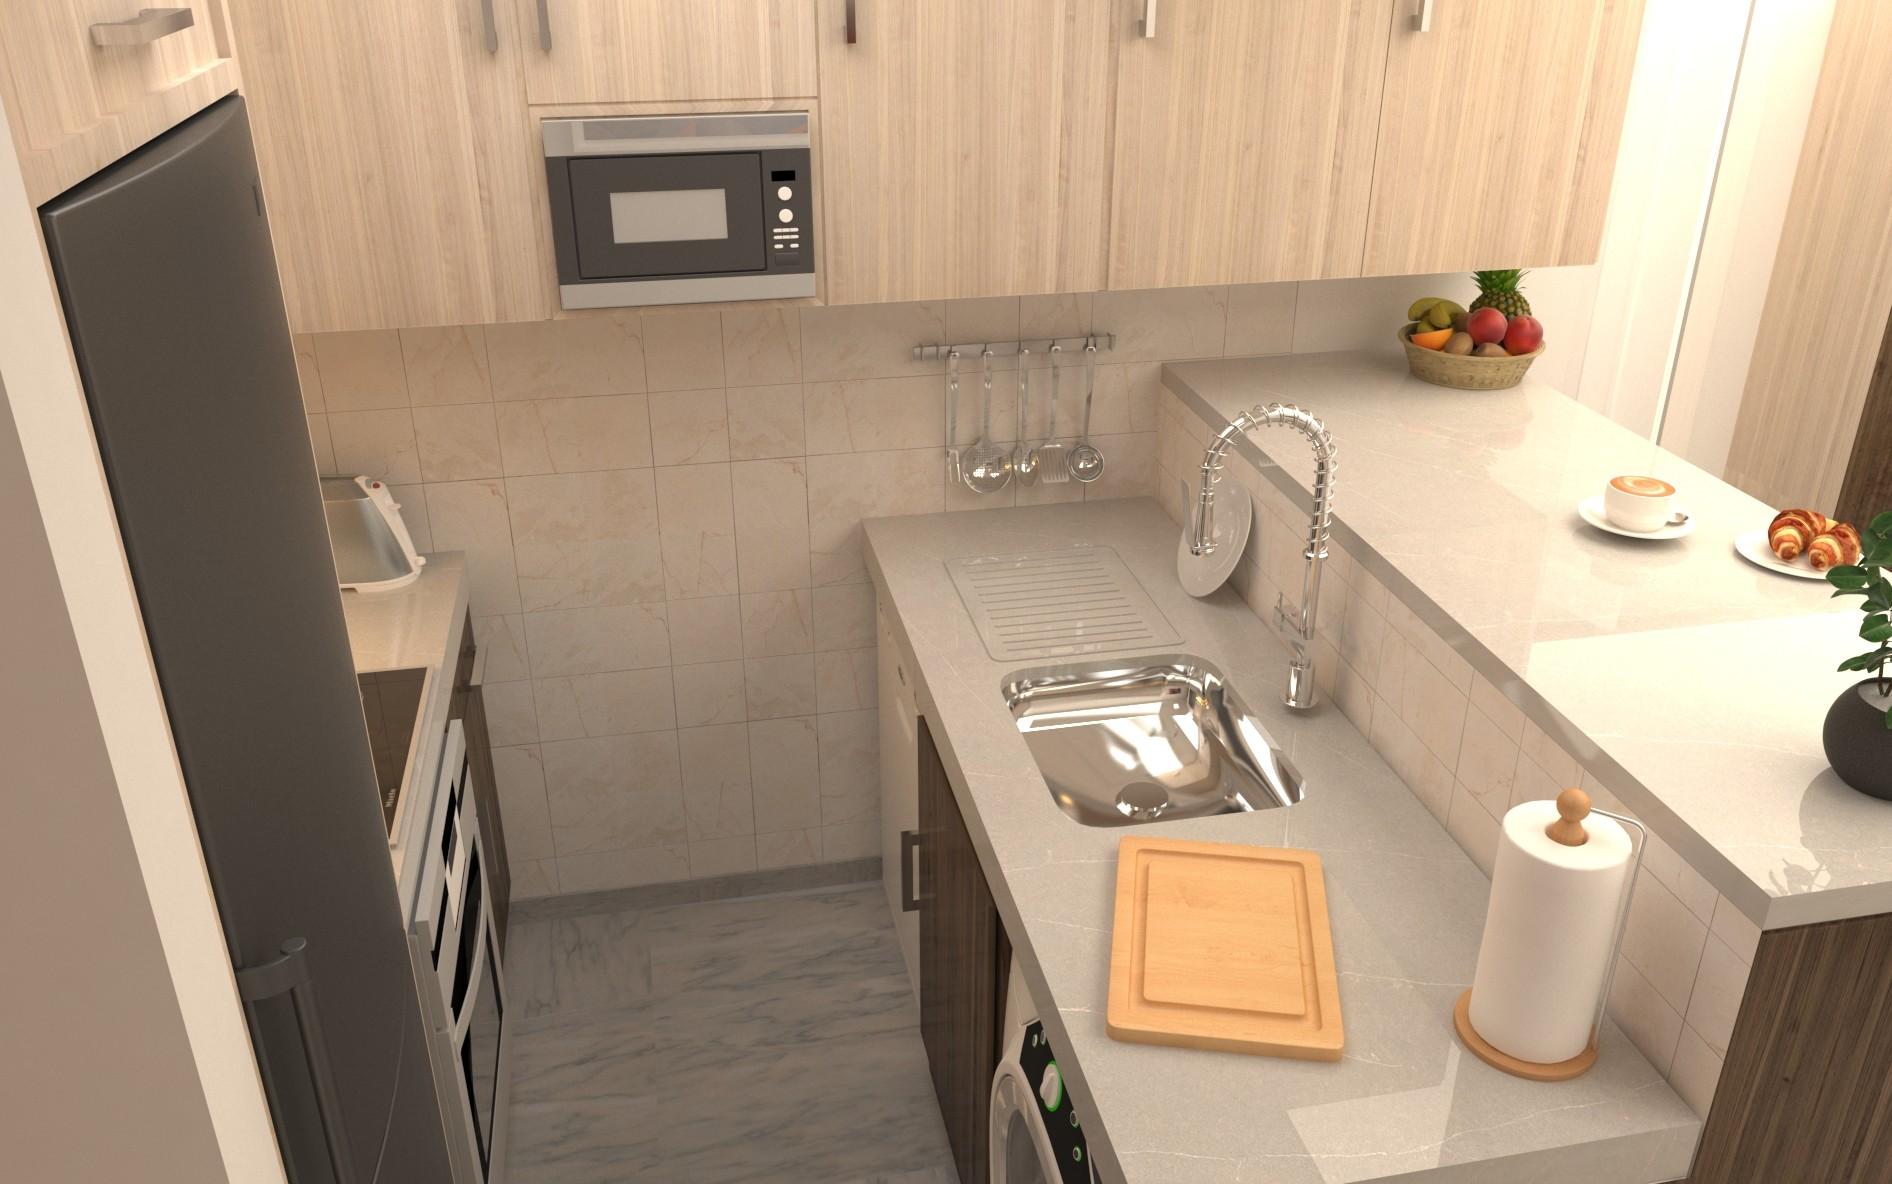 Salvador Pérez Ávila Reform Of My Own Apartment Living Room And Kitchen